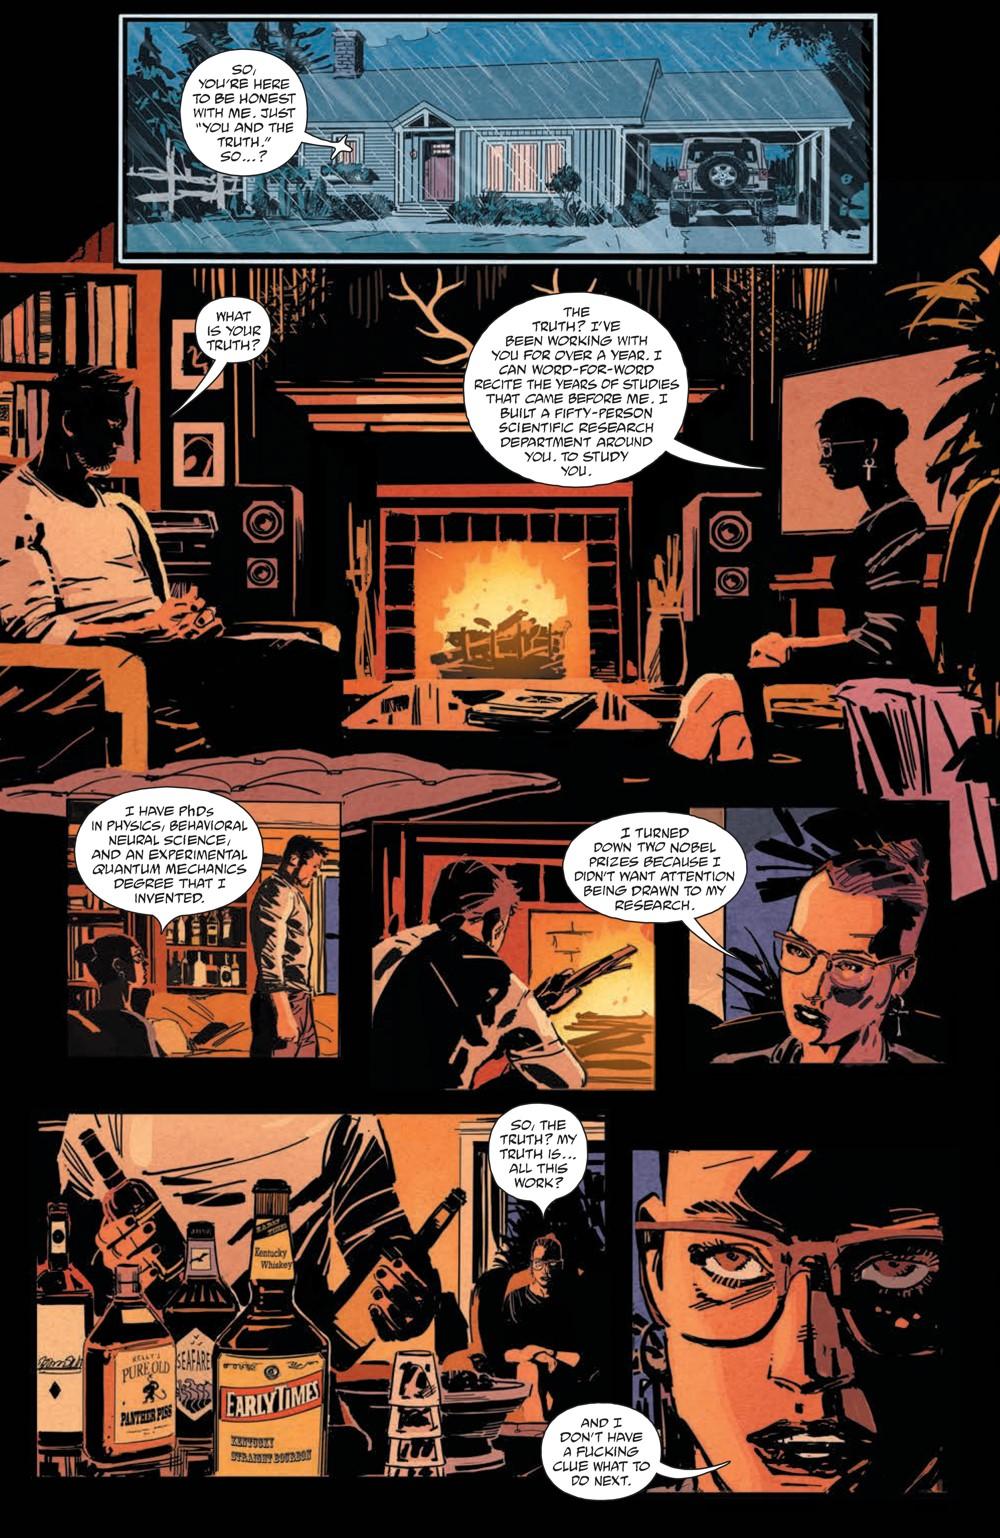 BRZRKR_005_PRESS_4 ComicList Previews: BRZRKR #5 (Of 12)